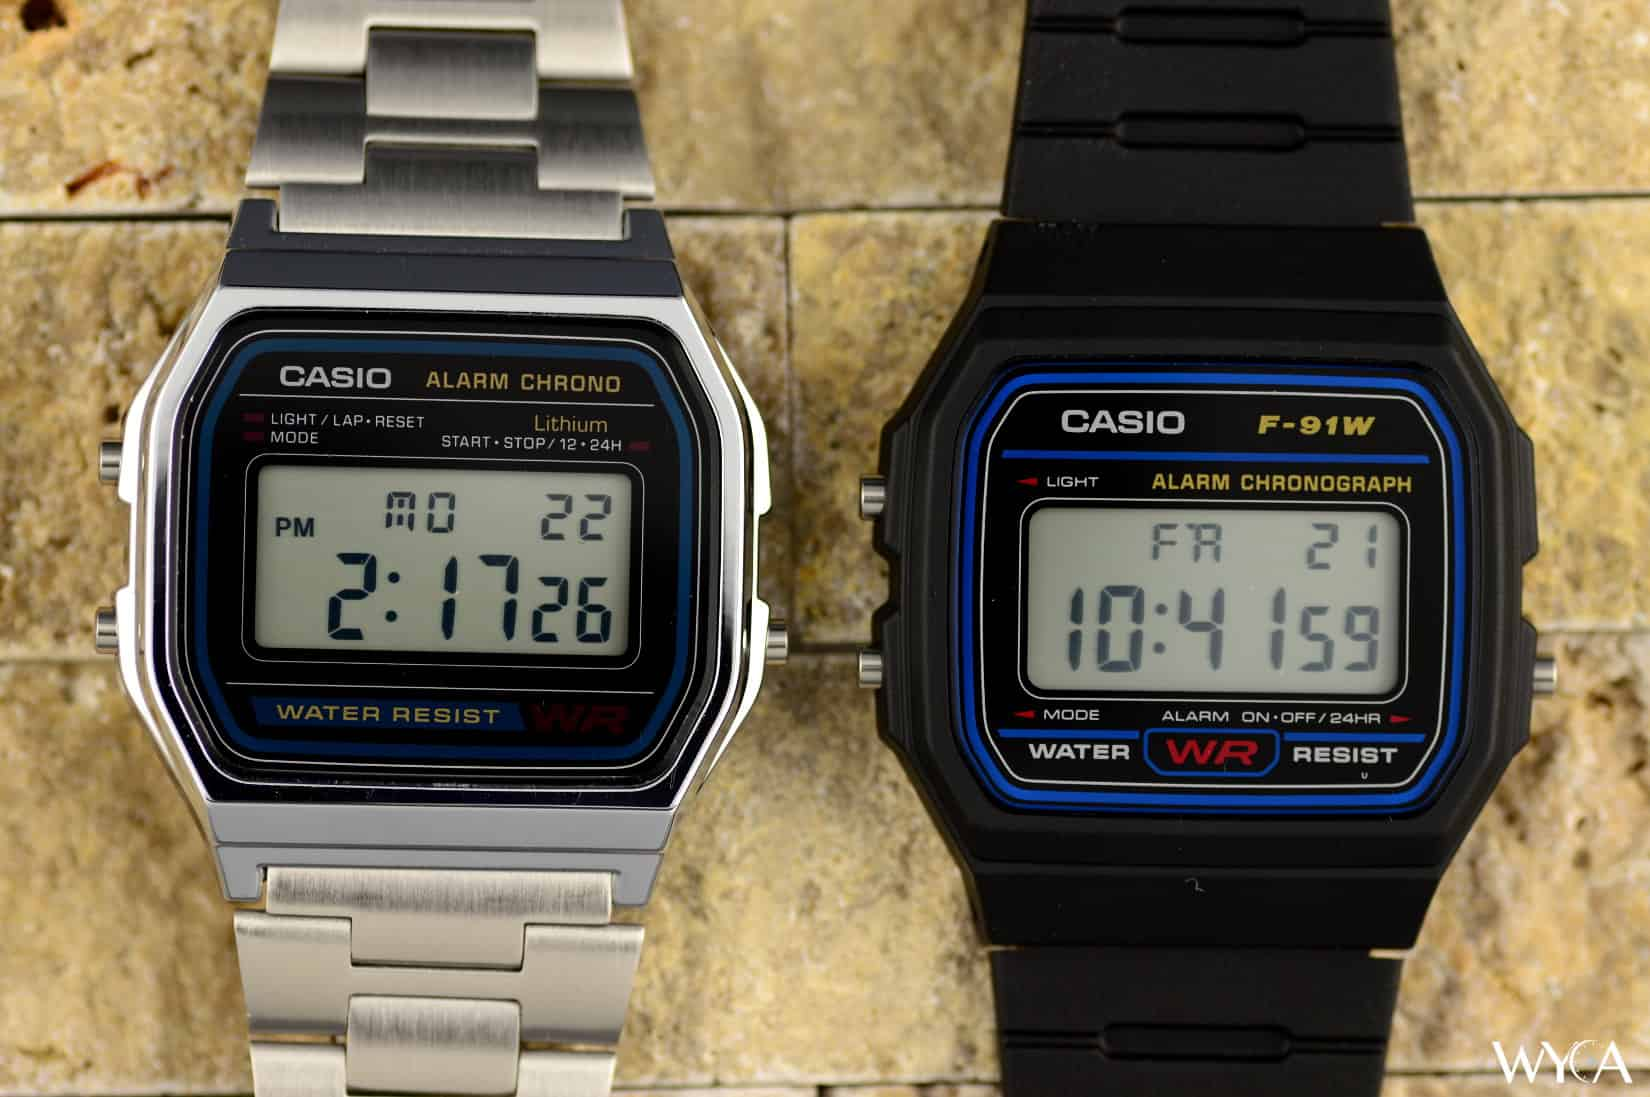 Casio F-91W & Casio A-158W Digital Watches